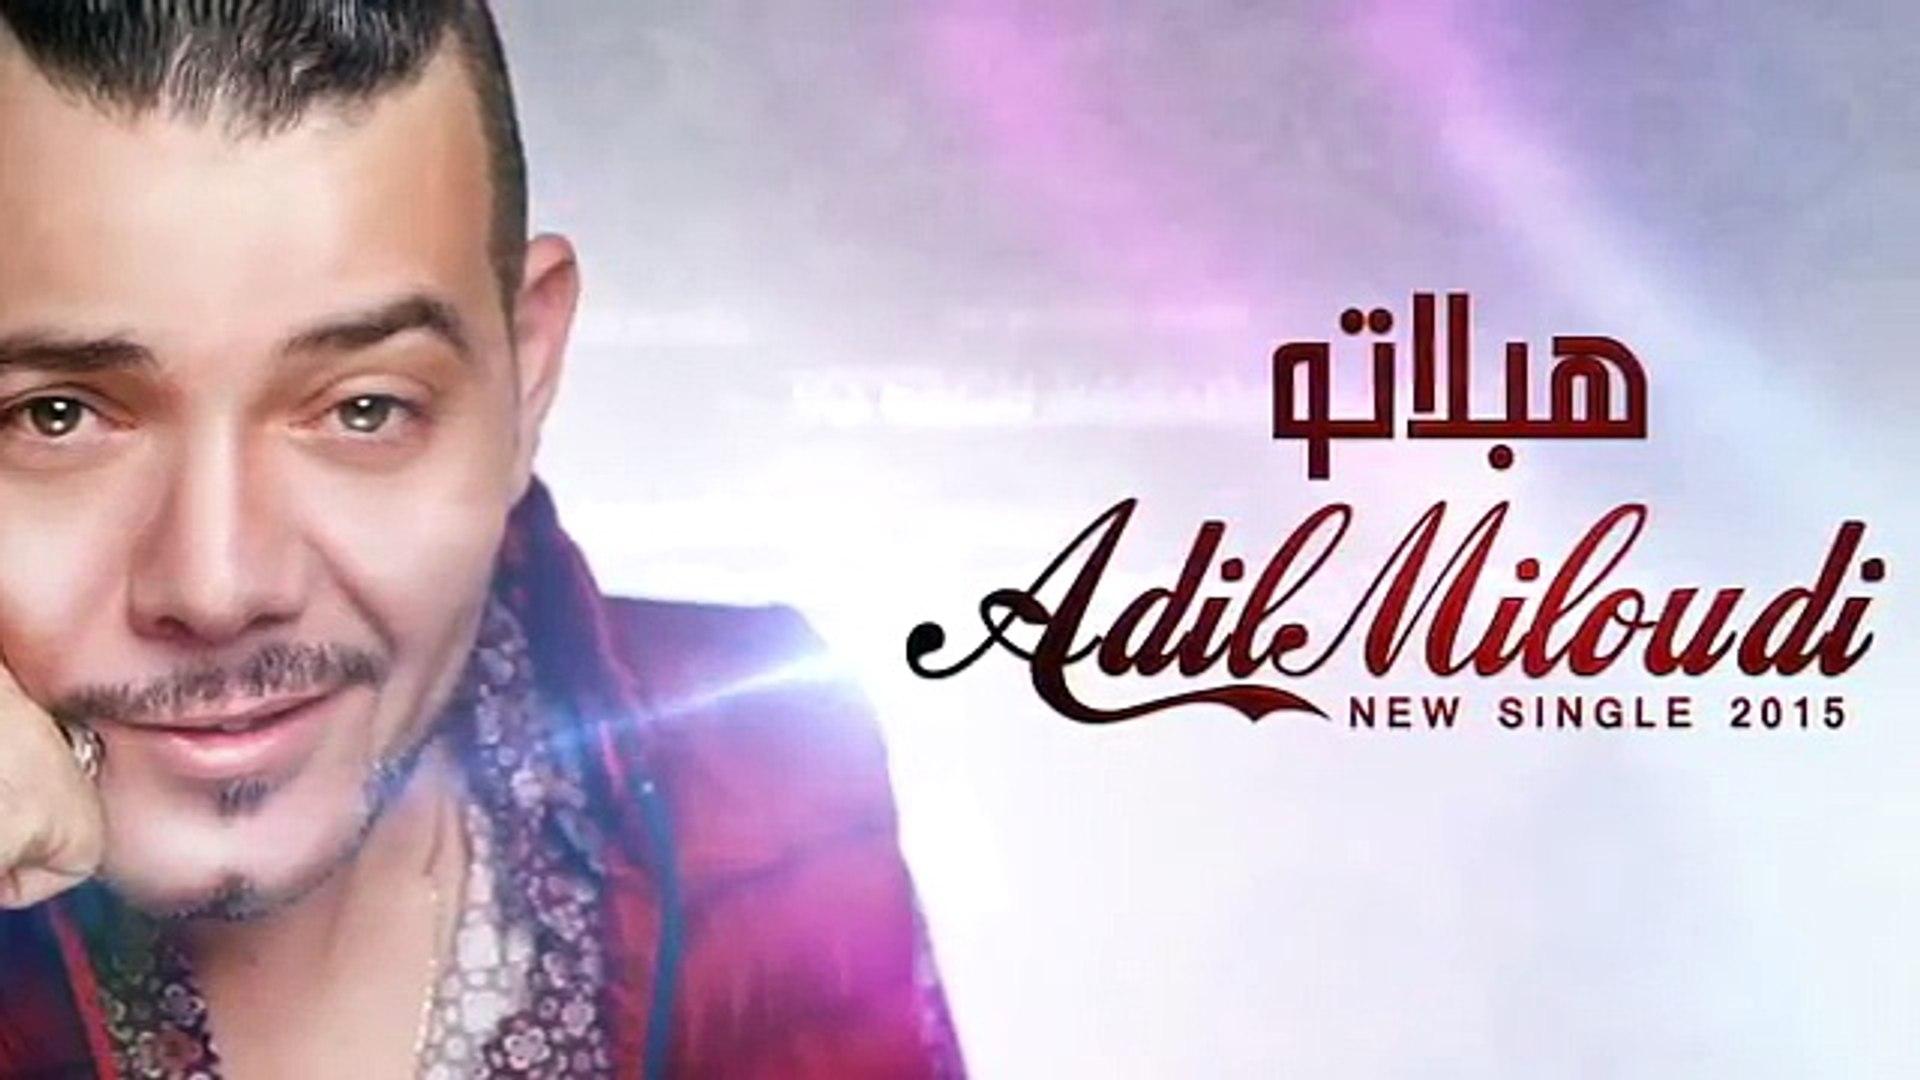 Adil Miloudi - Heblatou 2015 عادل الميلودي - هبلاتو